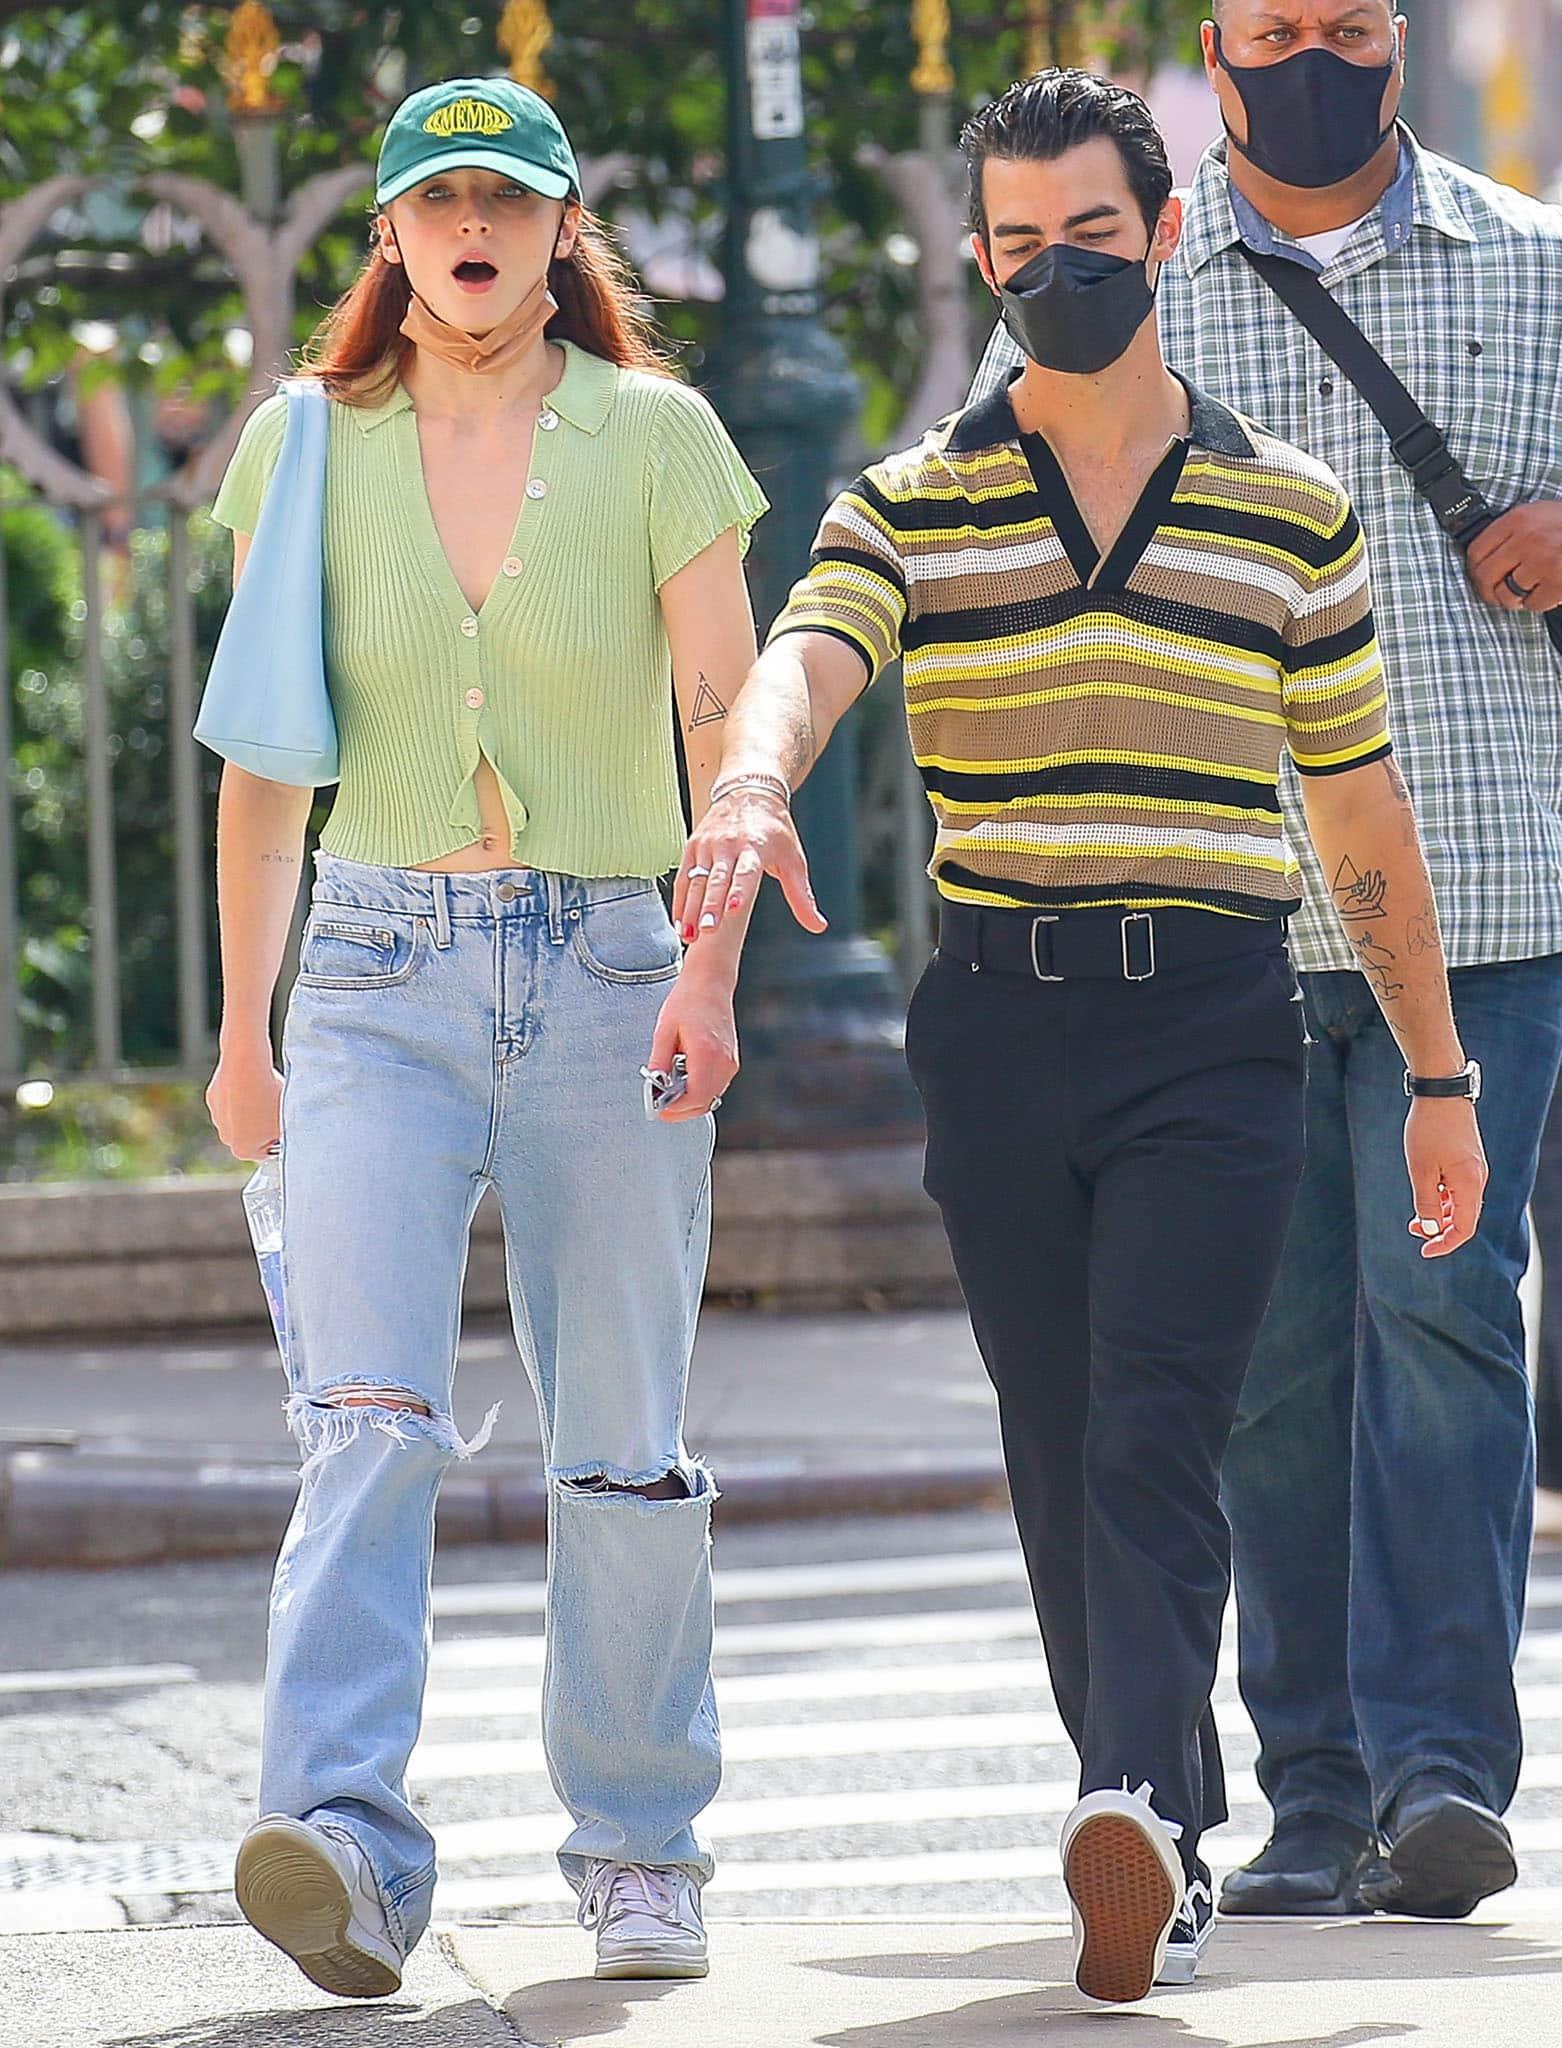 Sophie Turner and Joe Jonas walking around New York City in matching knitwear on September 21, 2021